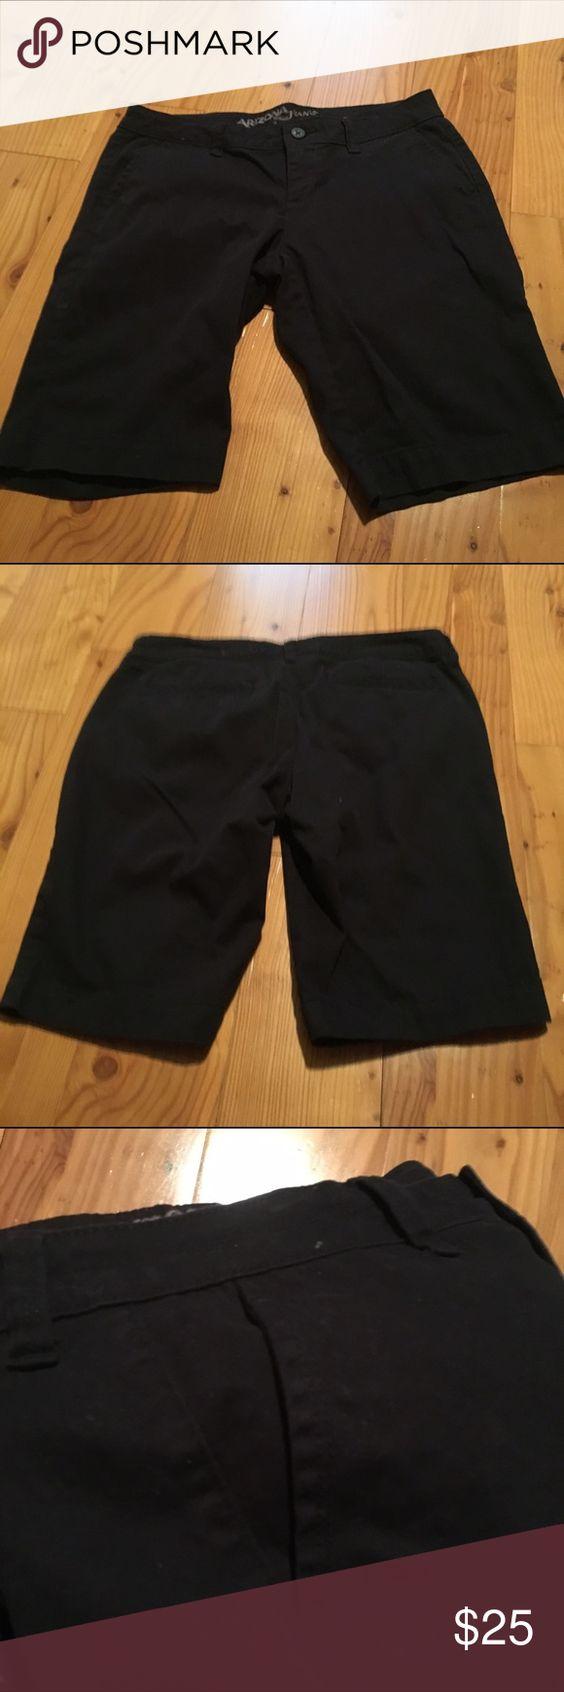 NWOT Black Bermuda Shorts Brand new, without tags! Black chino Bermuda shorts with pockets in front and back! Very comfortable! Arizona Jean Company Shorts Bermudas